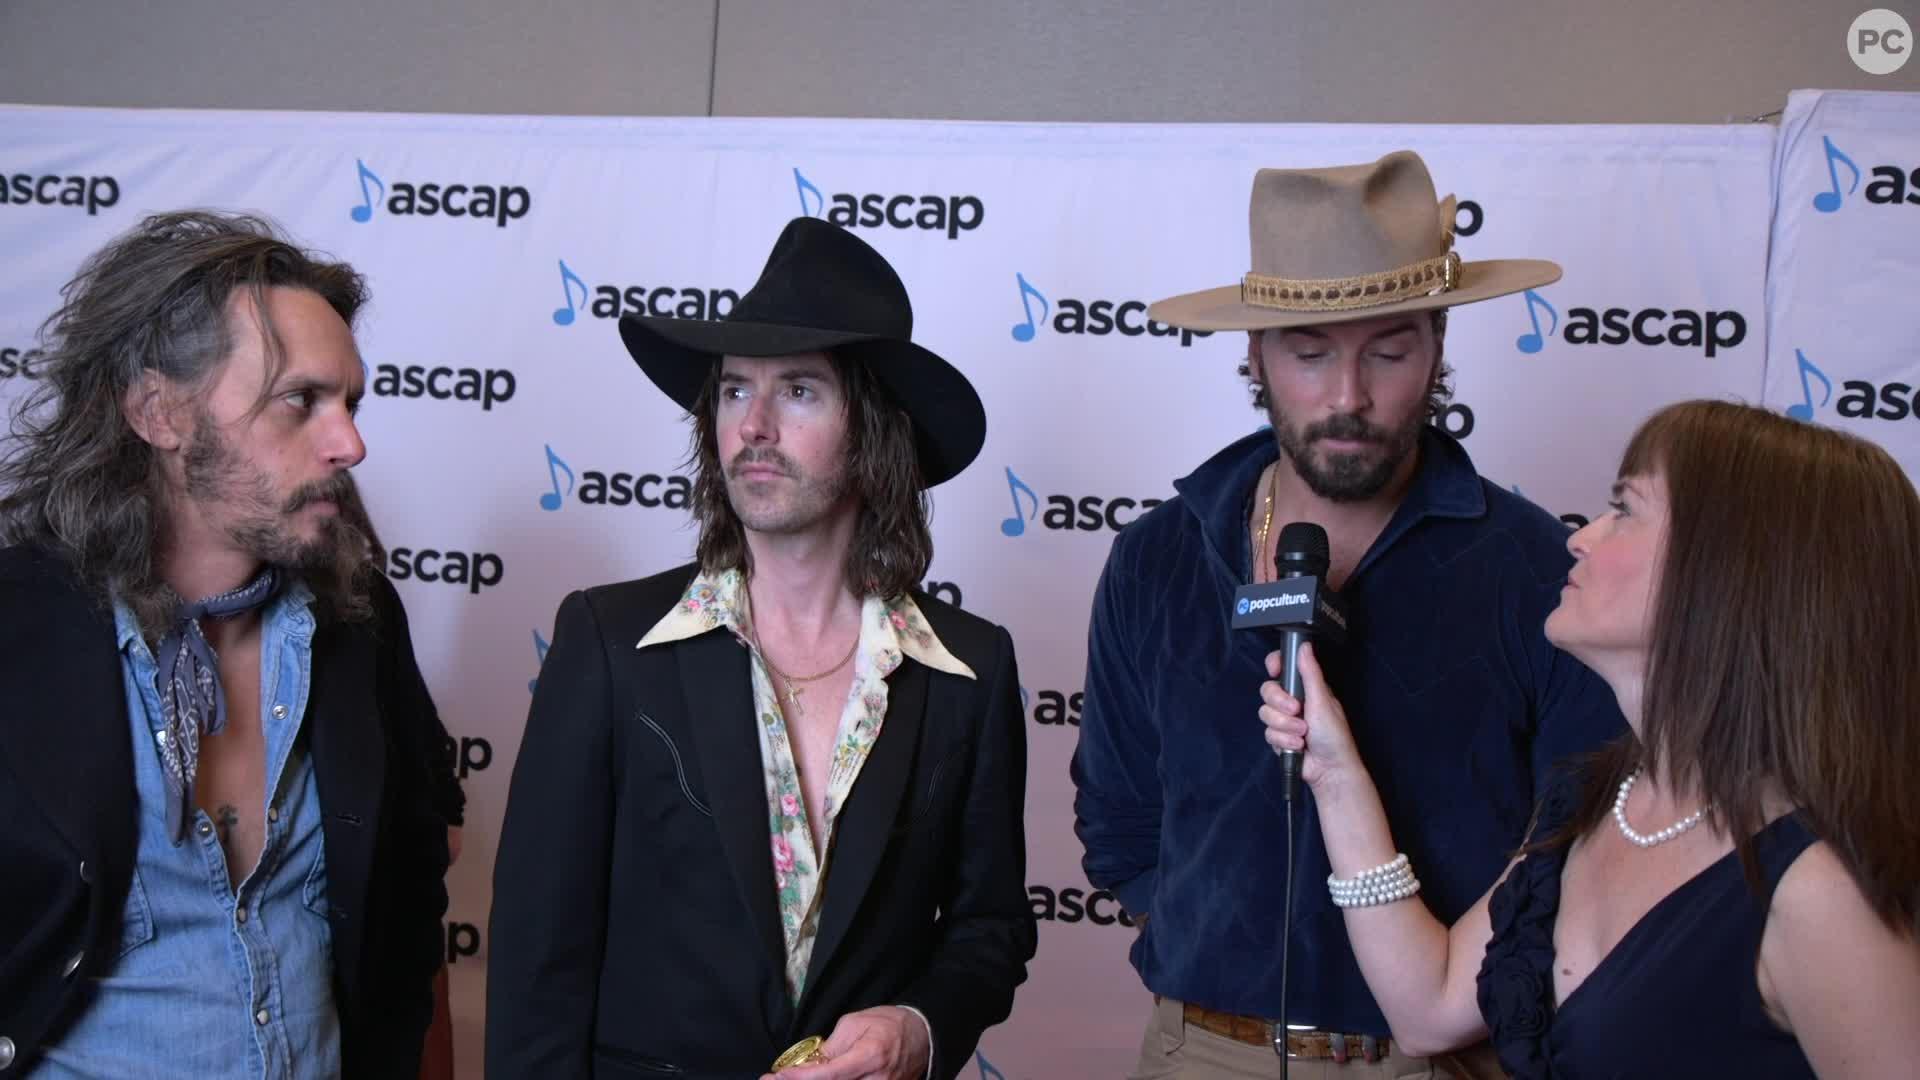 Midland - 2019 Ascap Award Ceremony screen capture